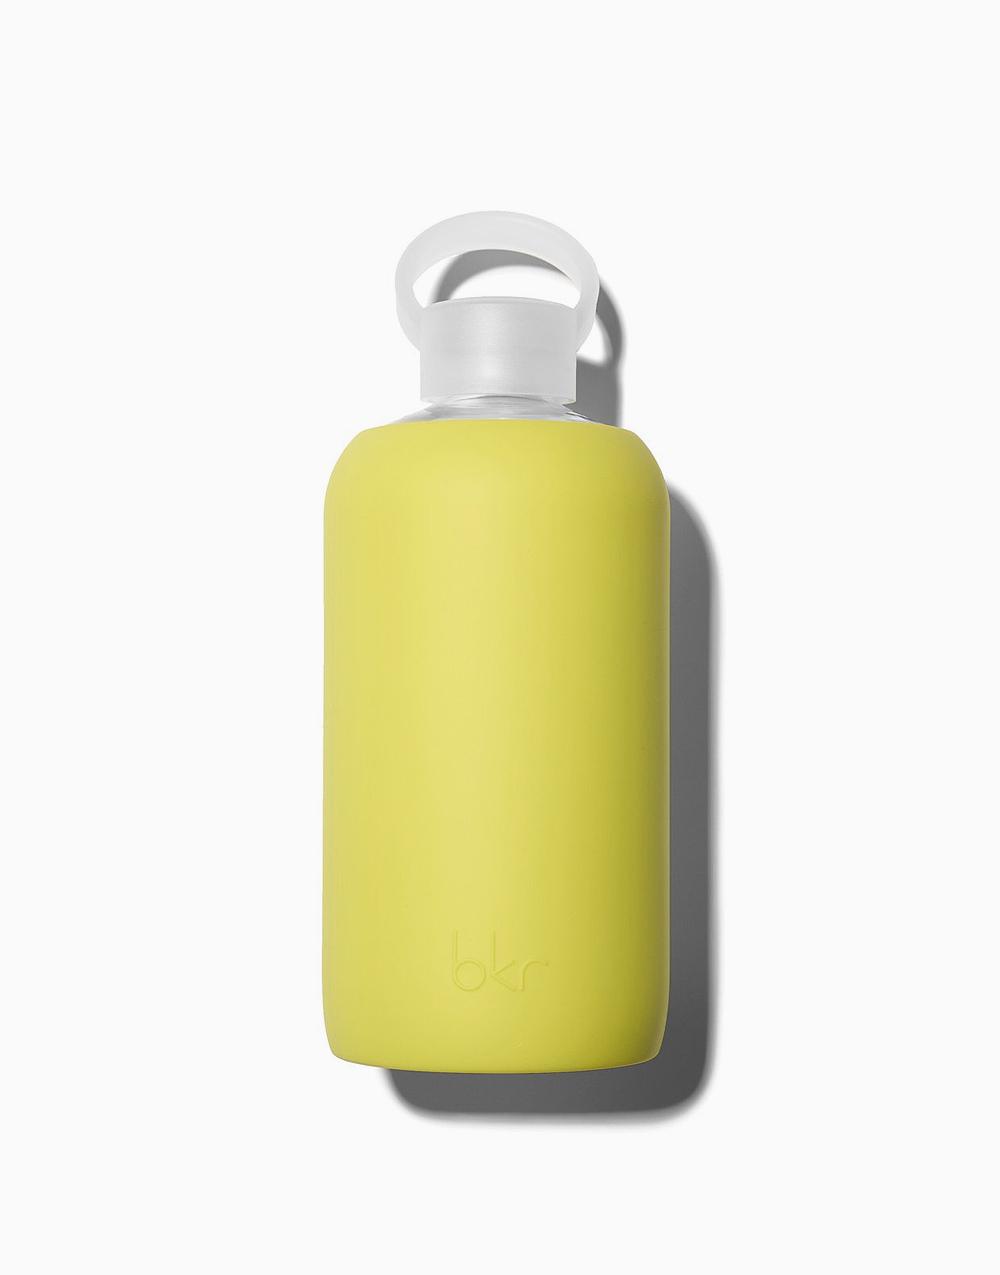 Big Water Bottle (1L) by Bkr | Gigi